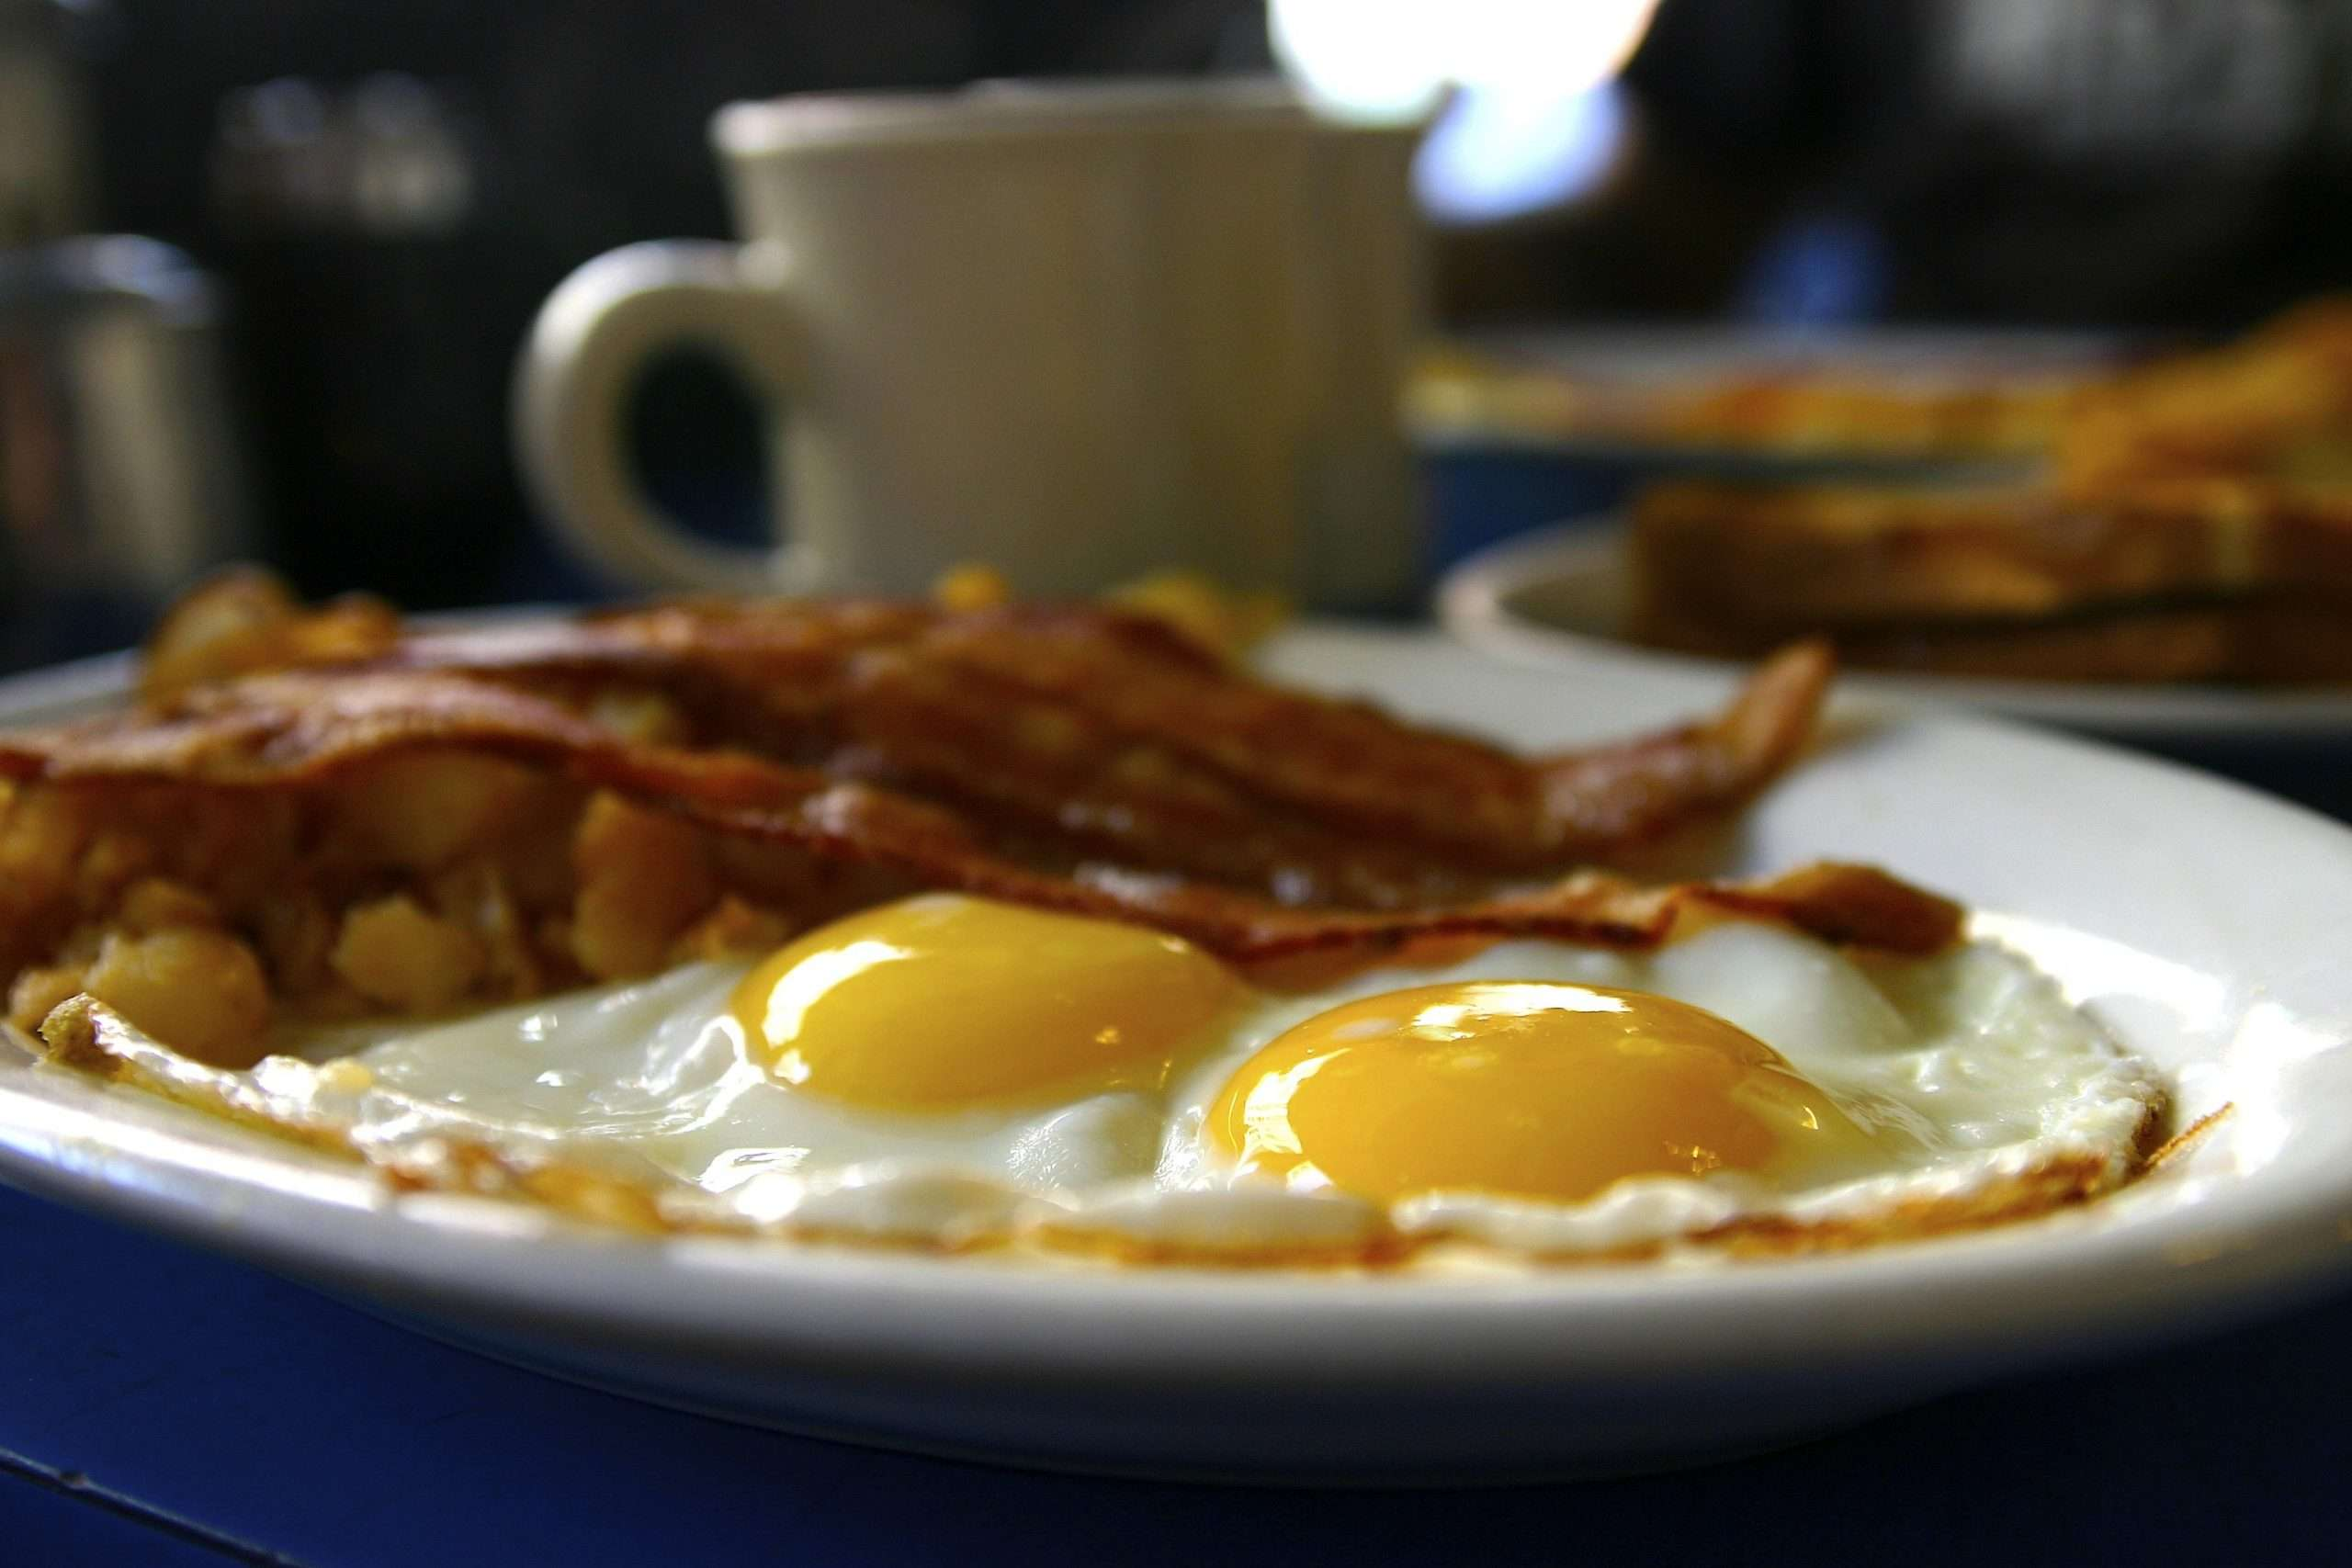 Breakfast at Keedy's